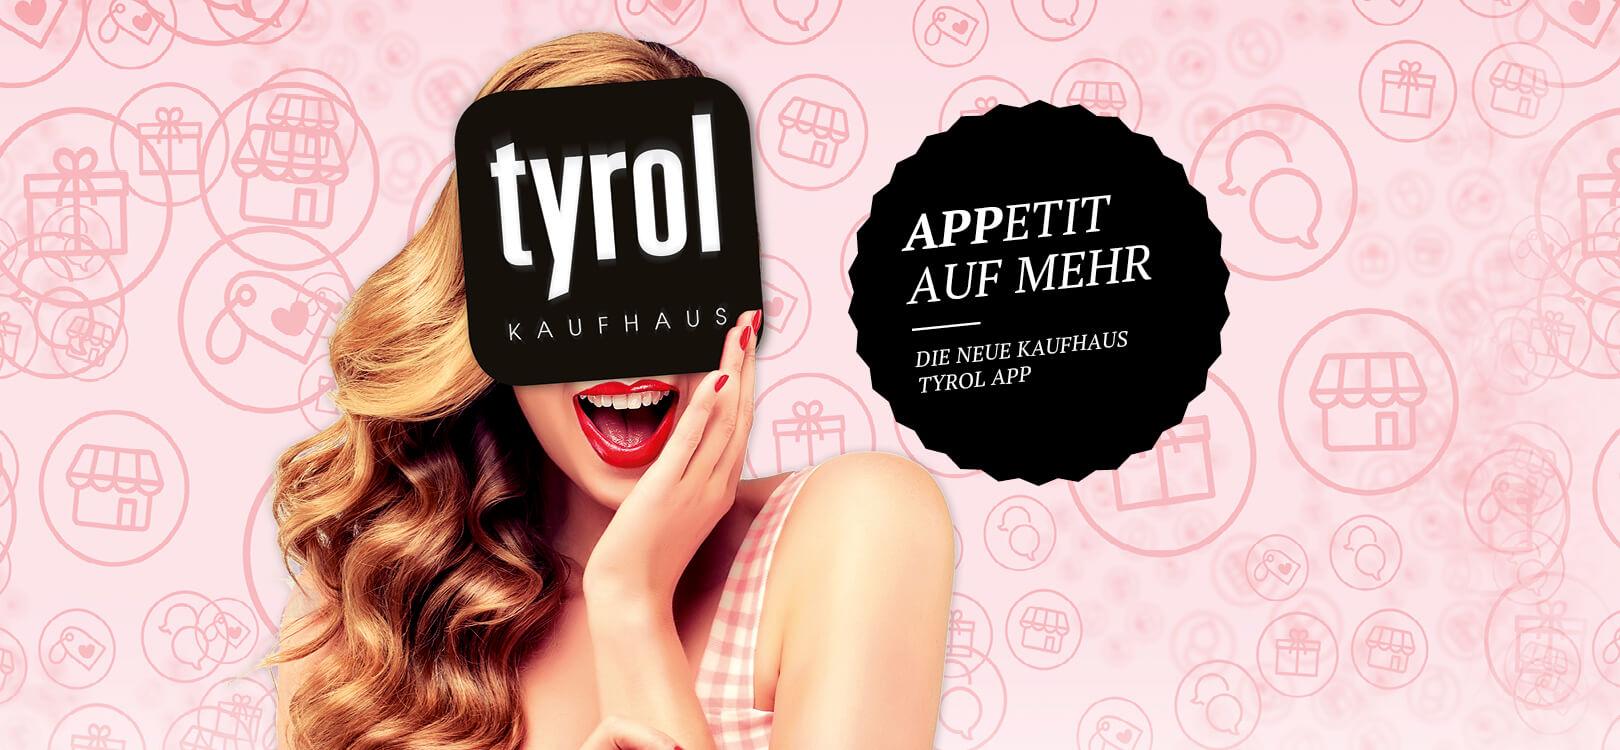 Kaufhaus Tyrol App